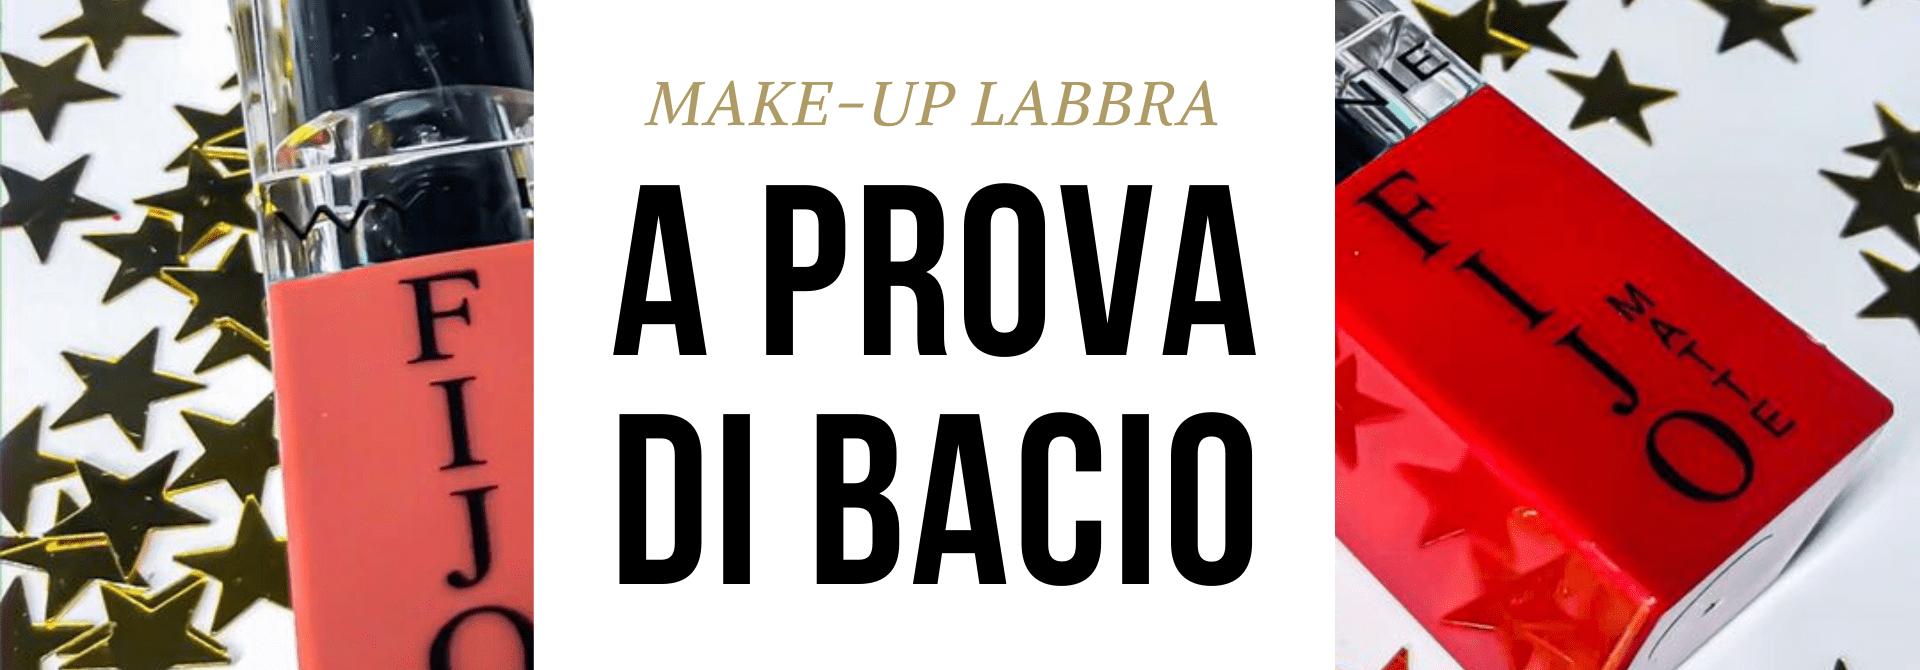 I prodotti di make-up labbra Wynie Cosmetics